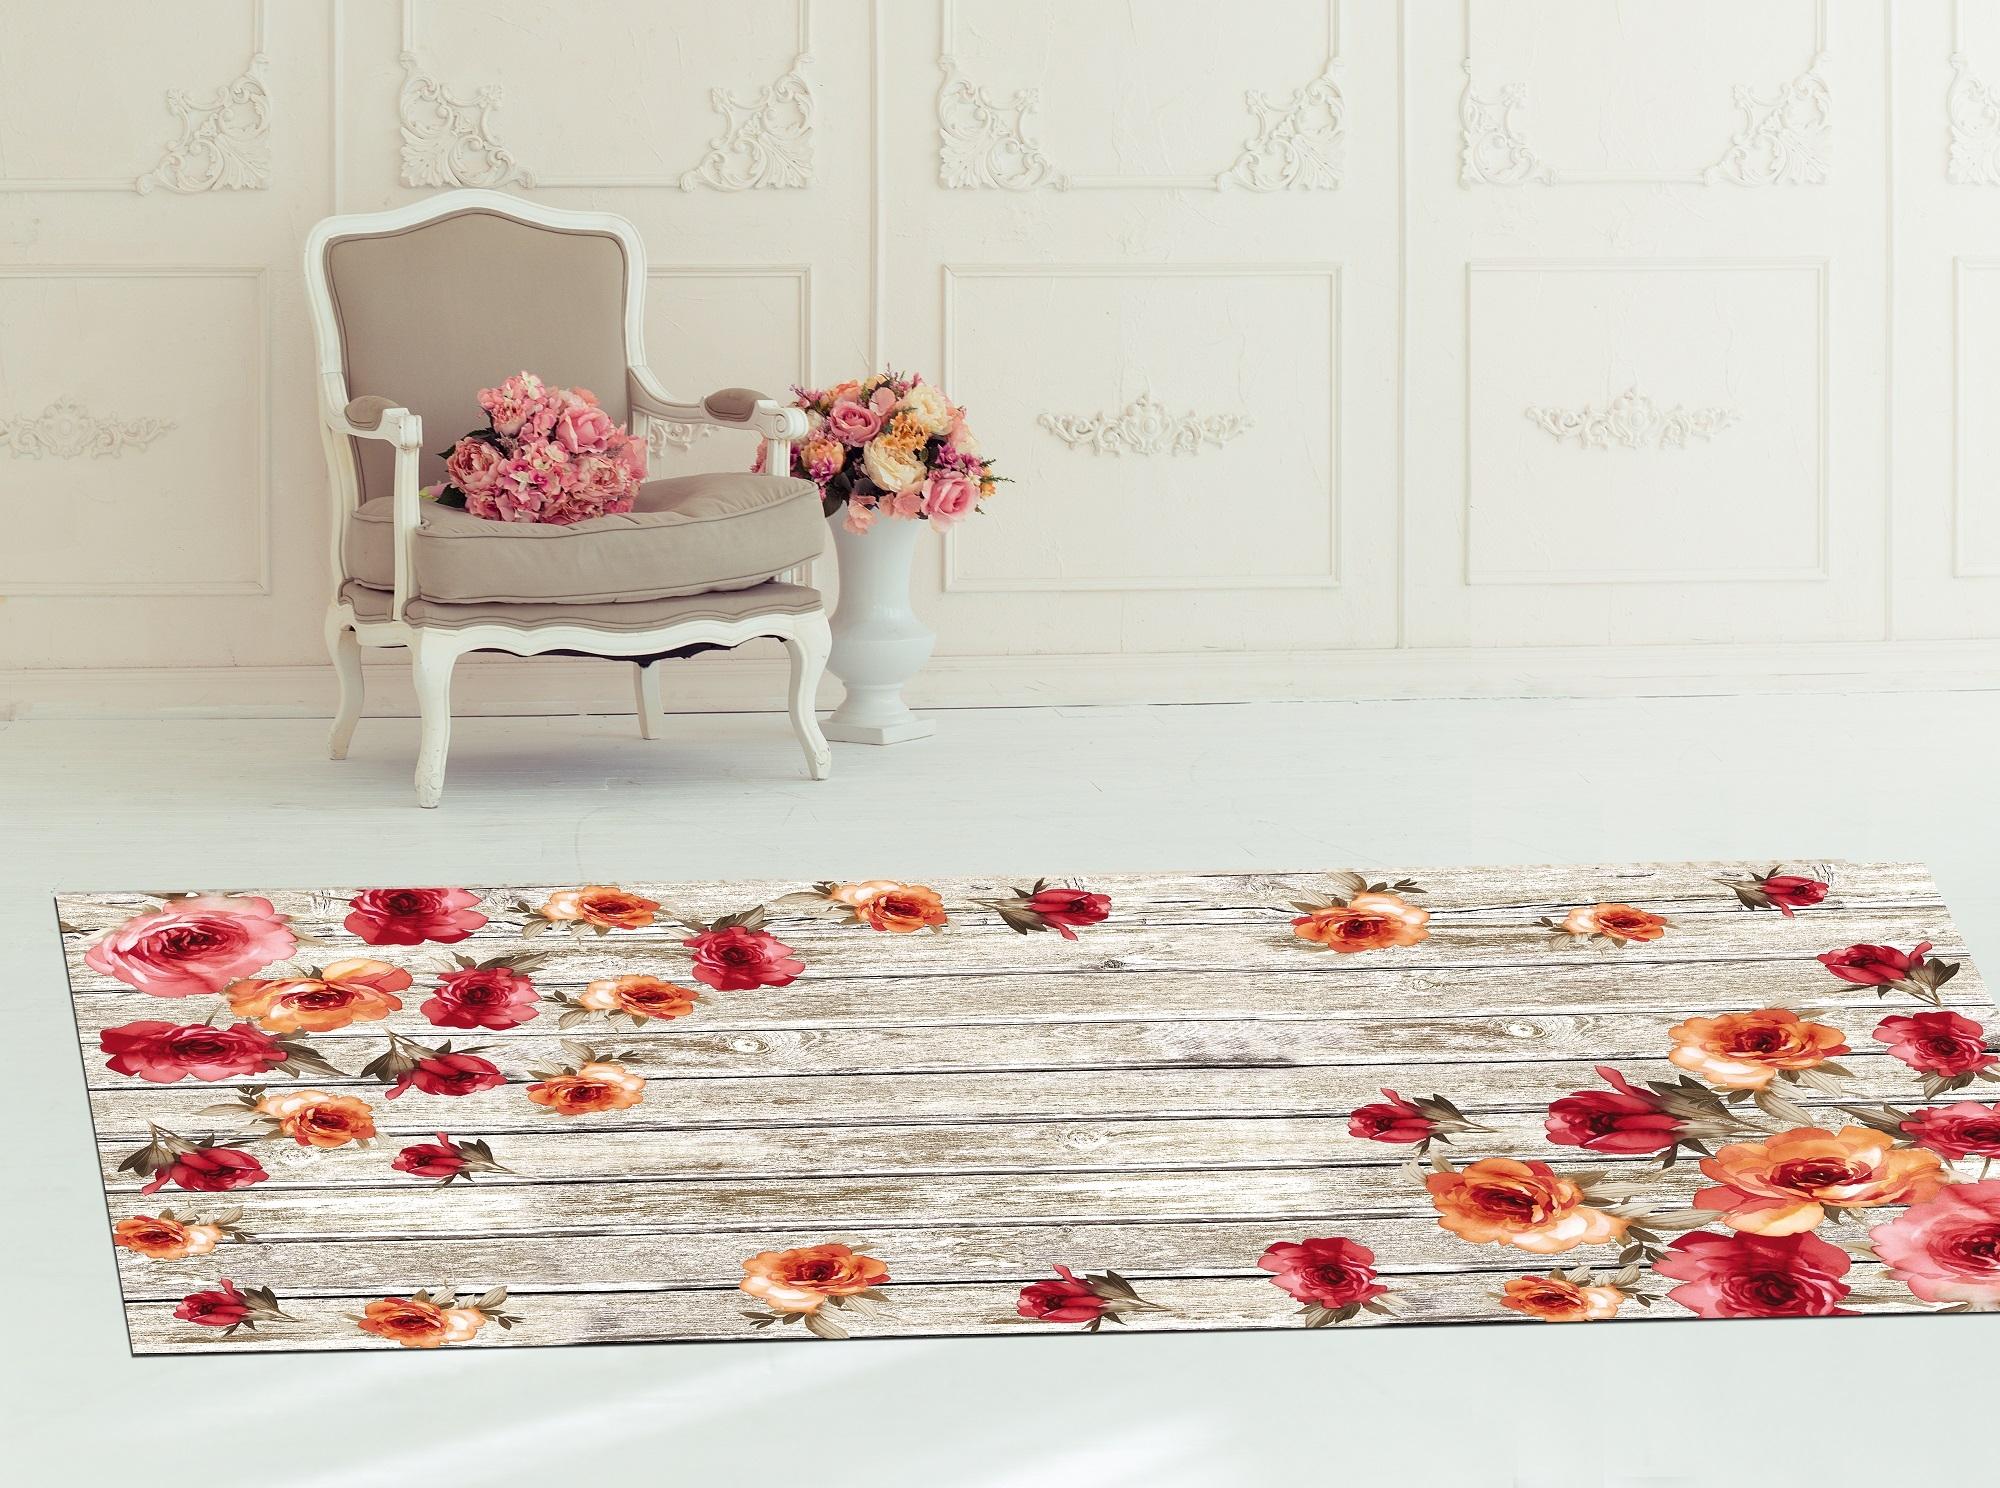 Covor Roses 5017 Multicolor, 80 x 200 cm